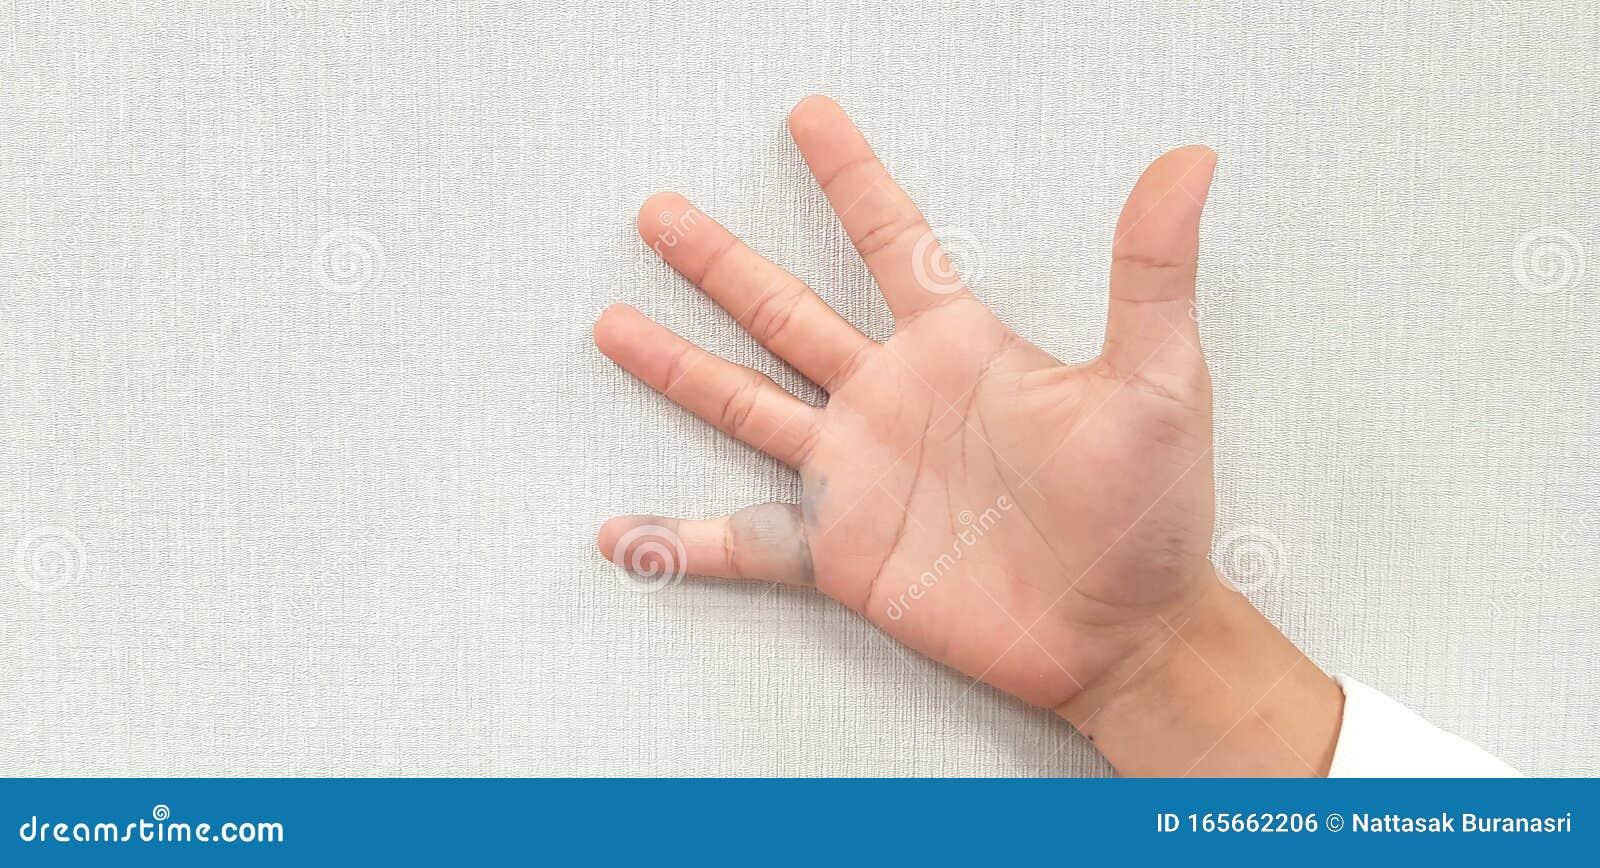 Tinctura pentru frectii impotriva varicelor | Health remedies, Health, Hand soap bottle